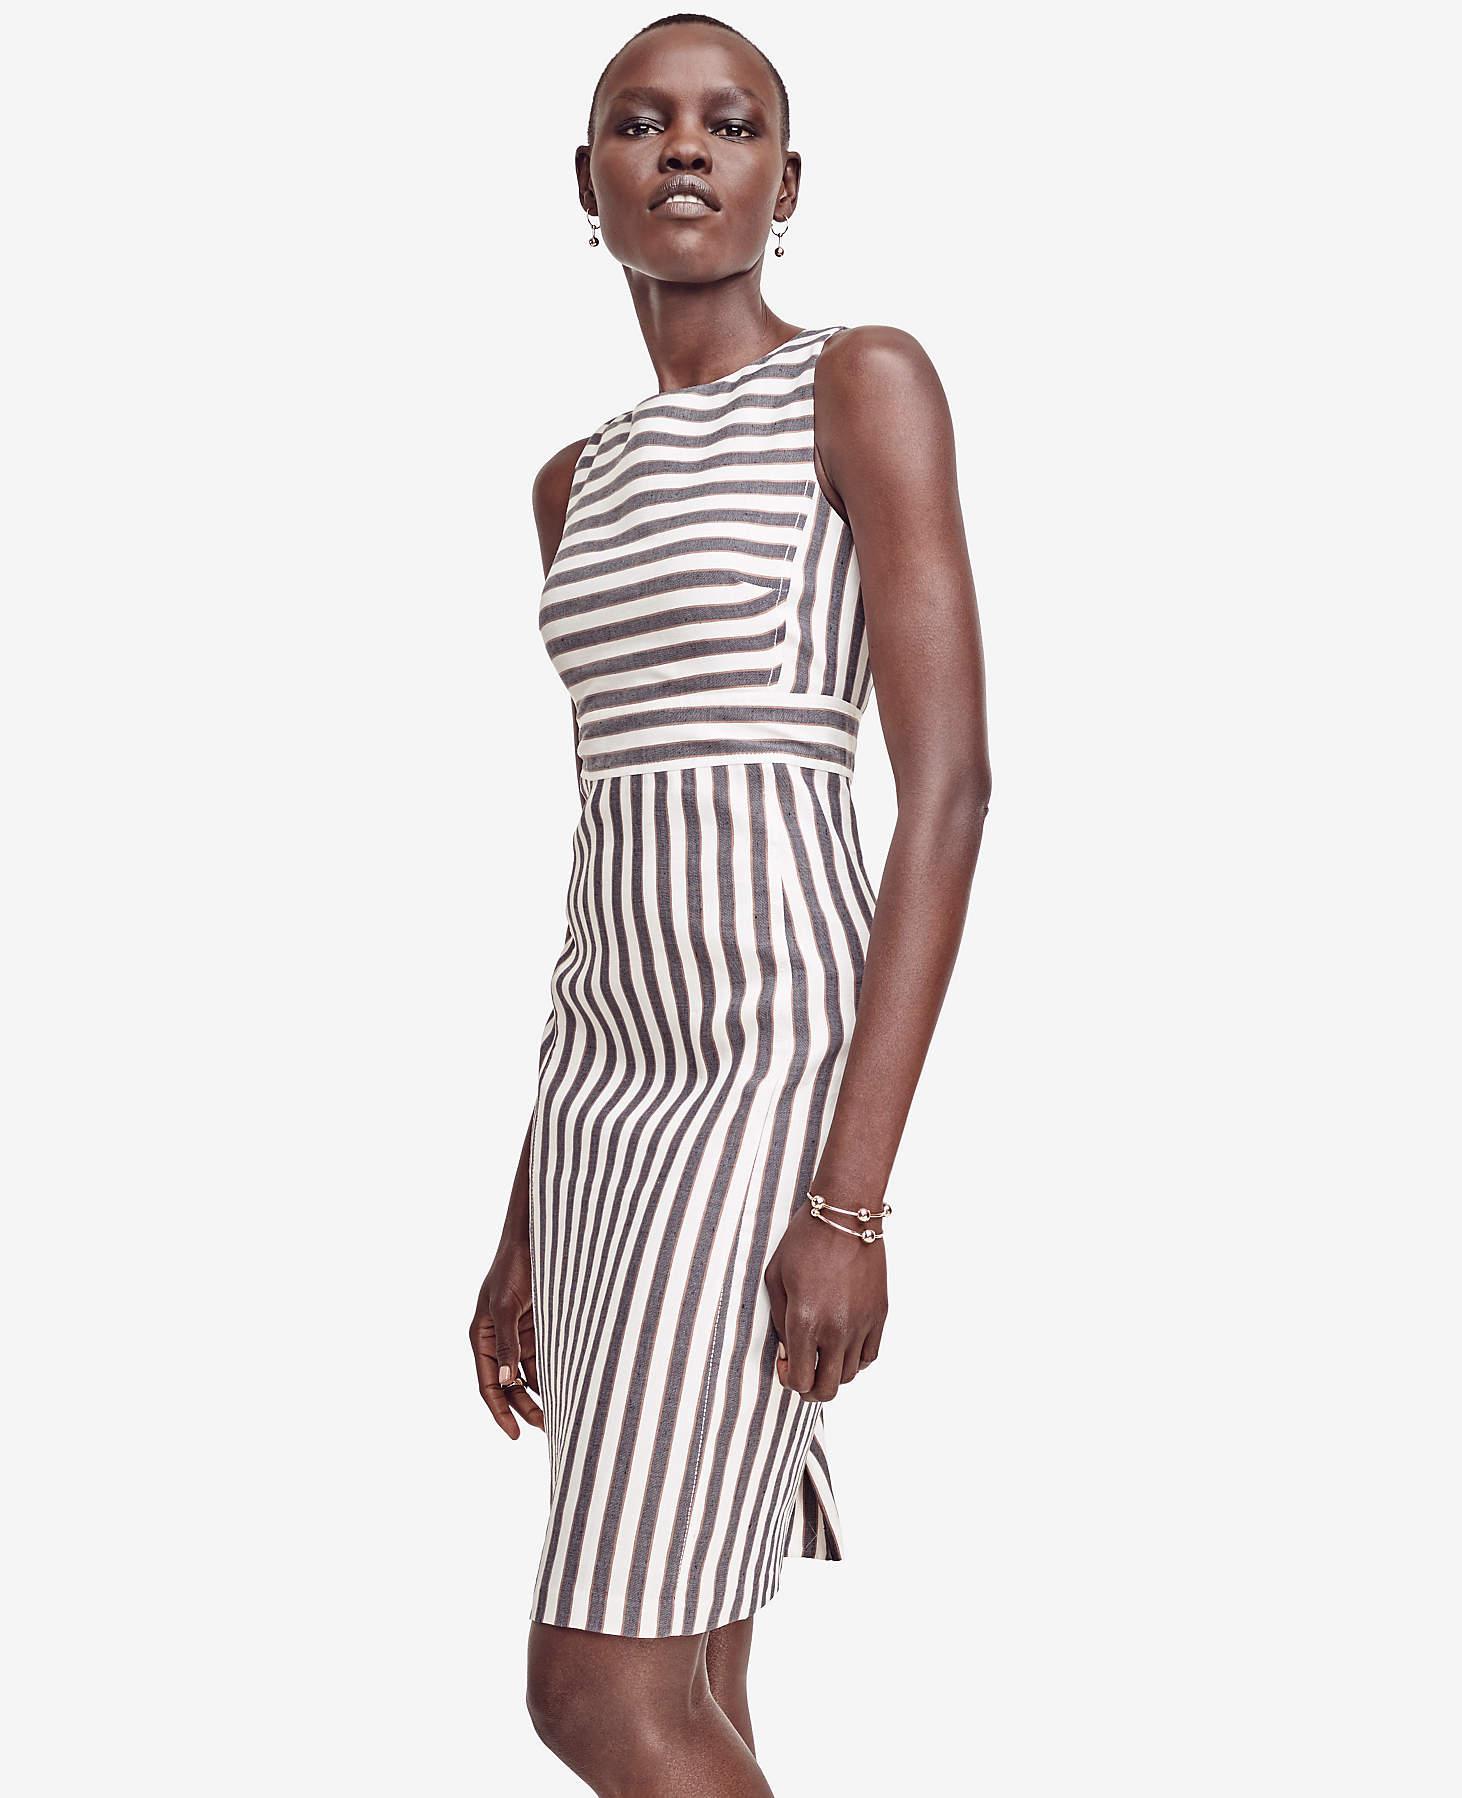 c1456921f1 Lyst - Ann Taylor Striped Linen Blend Sheath Dress in White